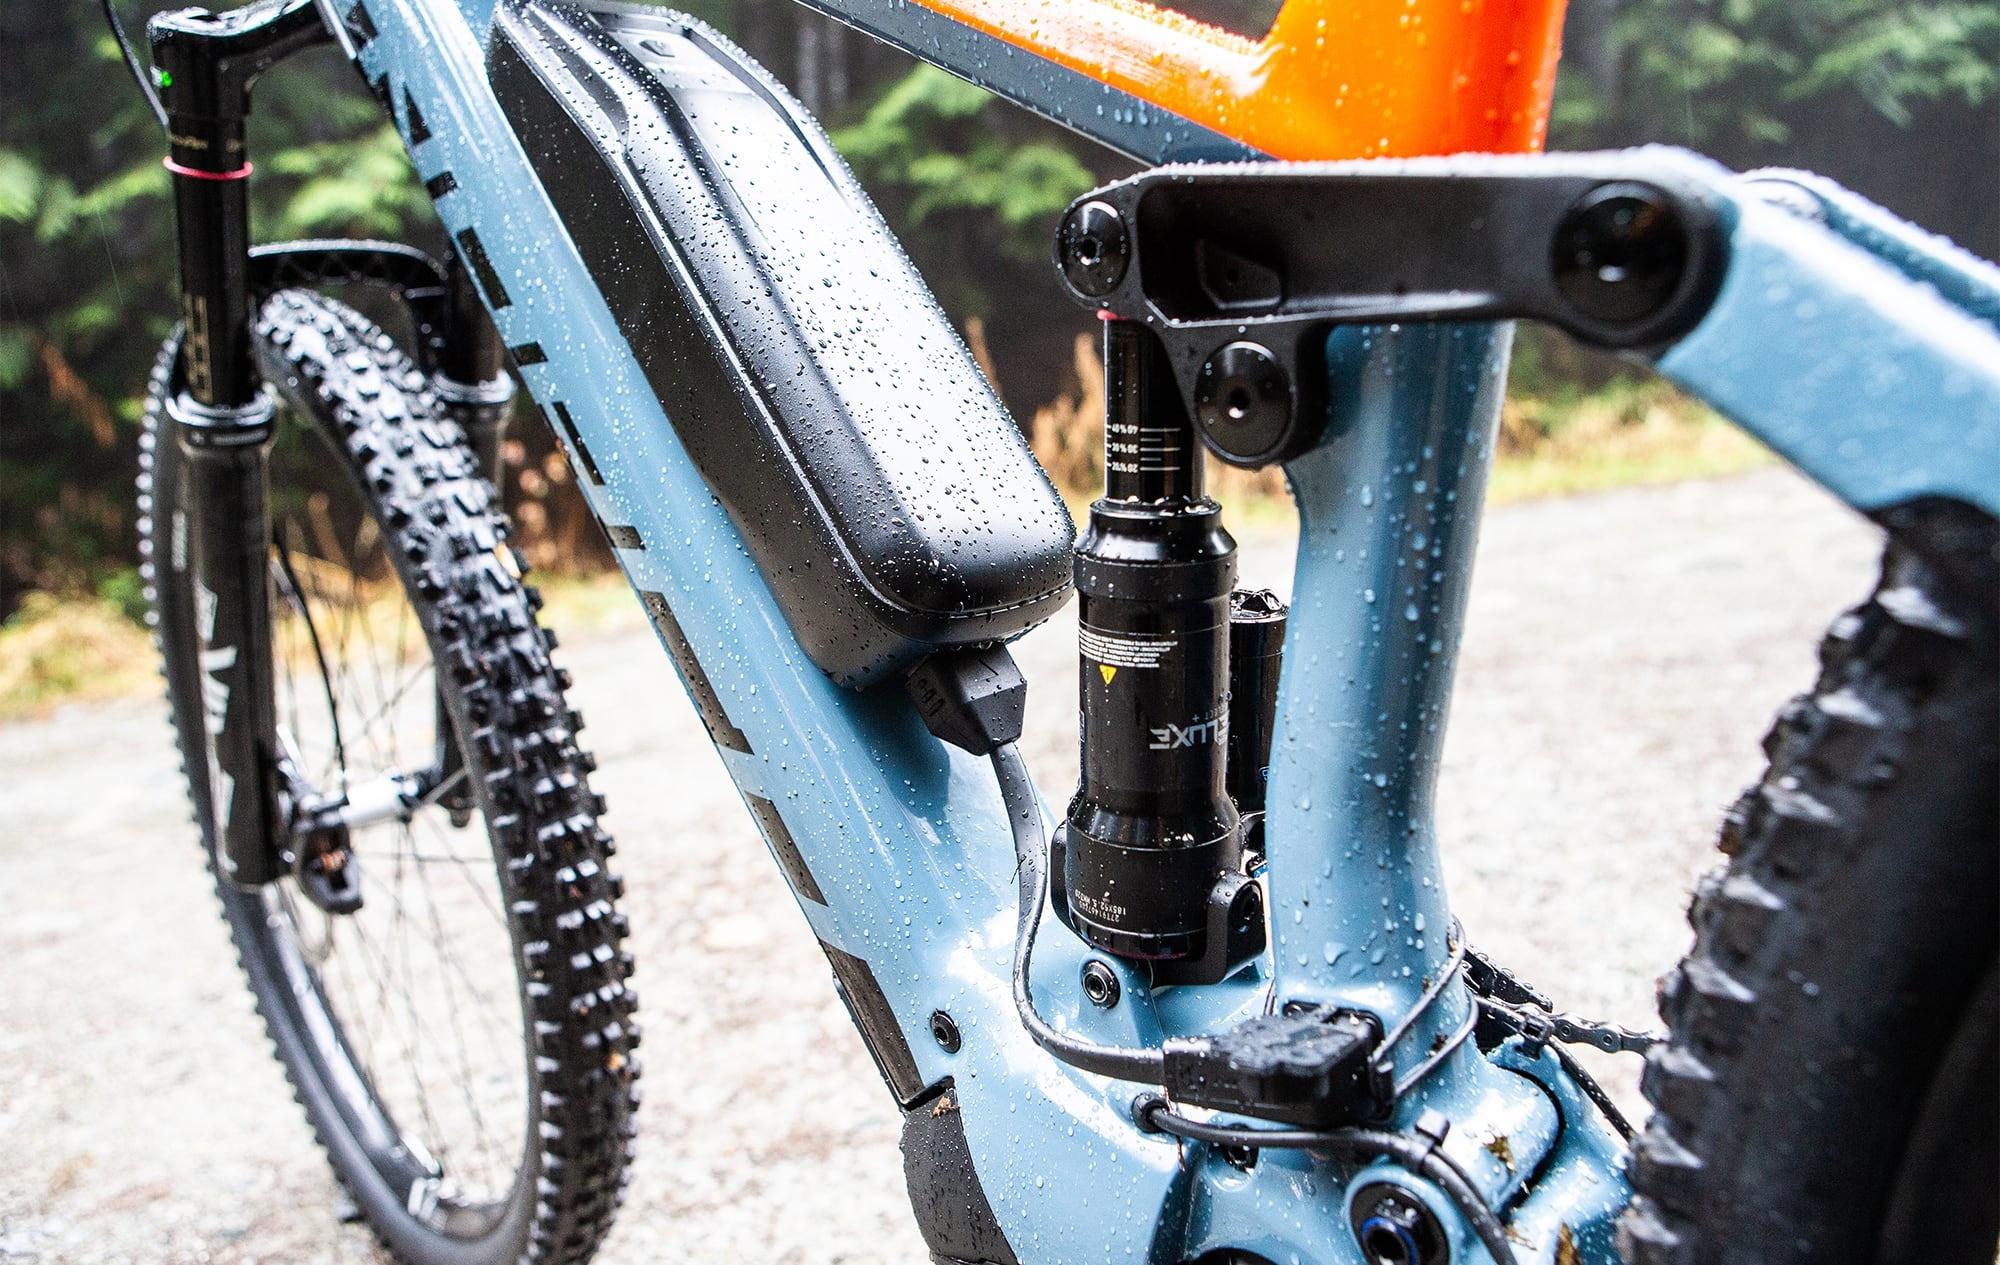 Vélo Norco Sight Vlt C1 Bleu/Orange 29''-4